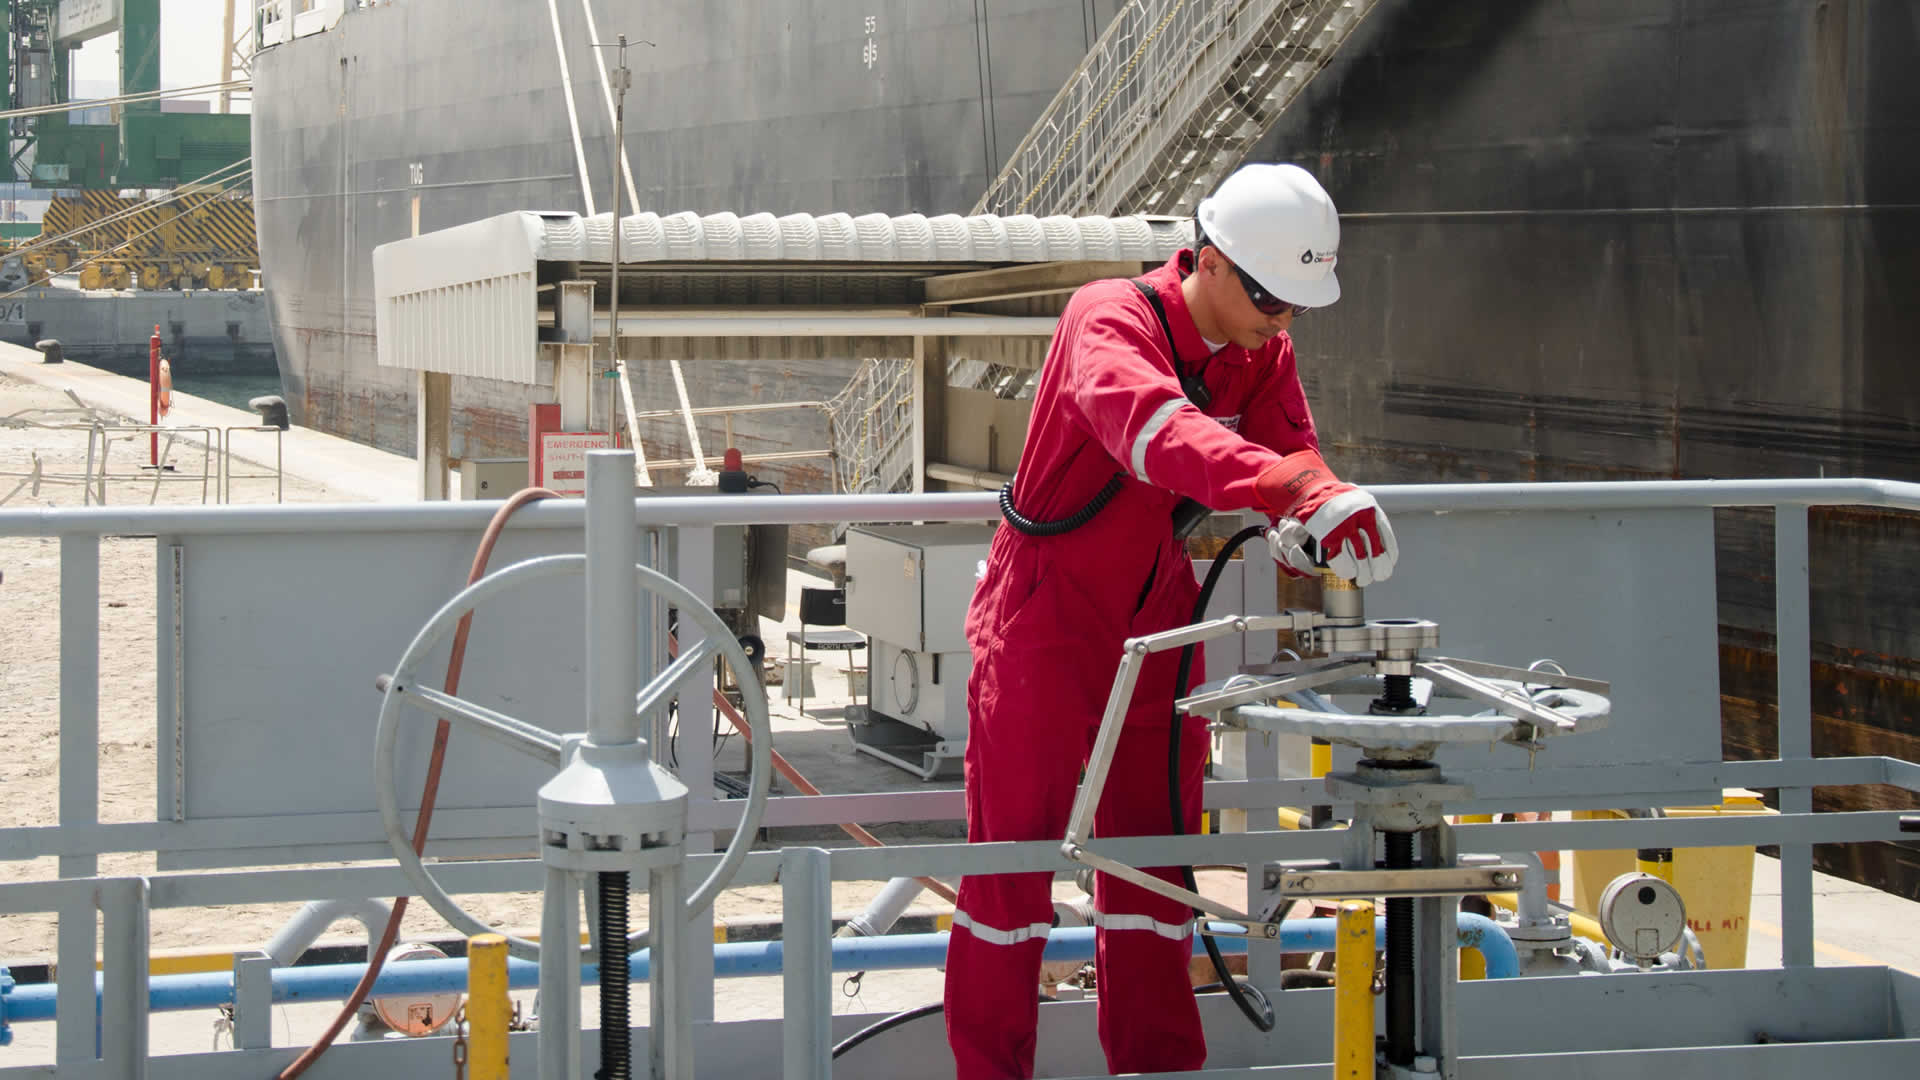 Portable valve actuator for manual multi -turn valves